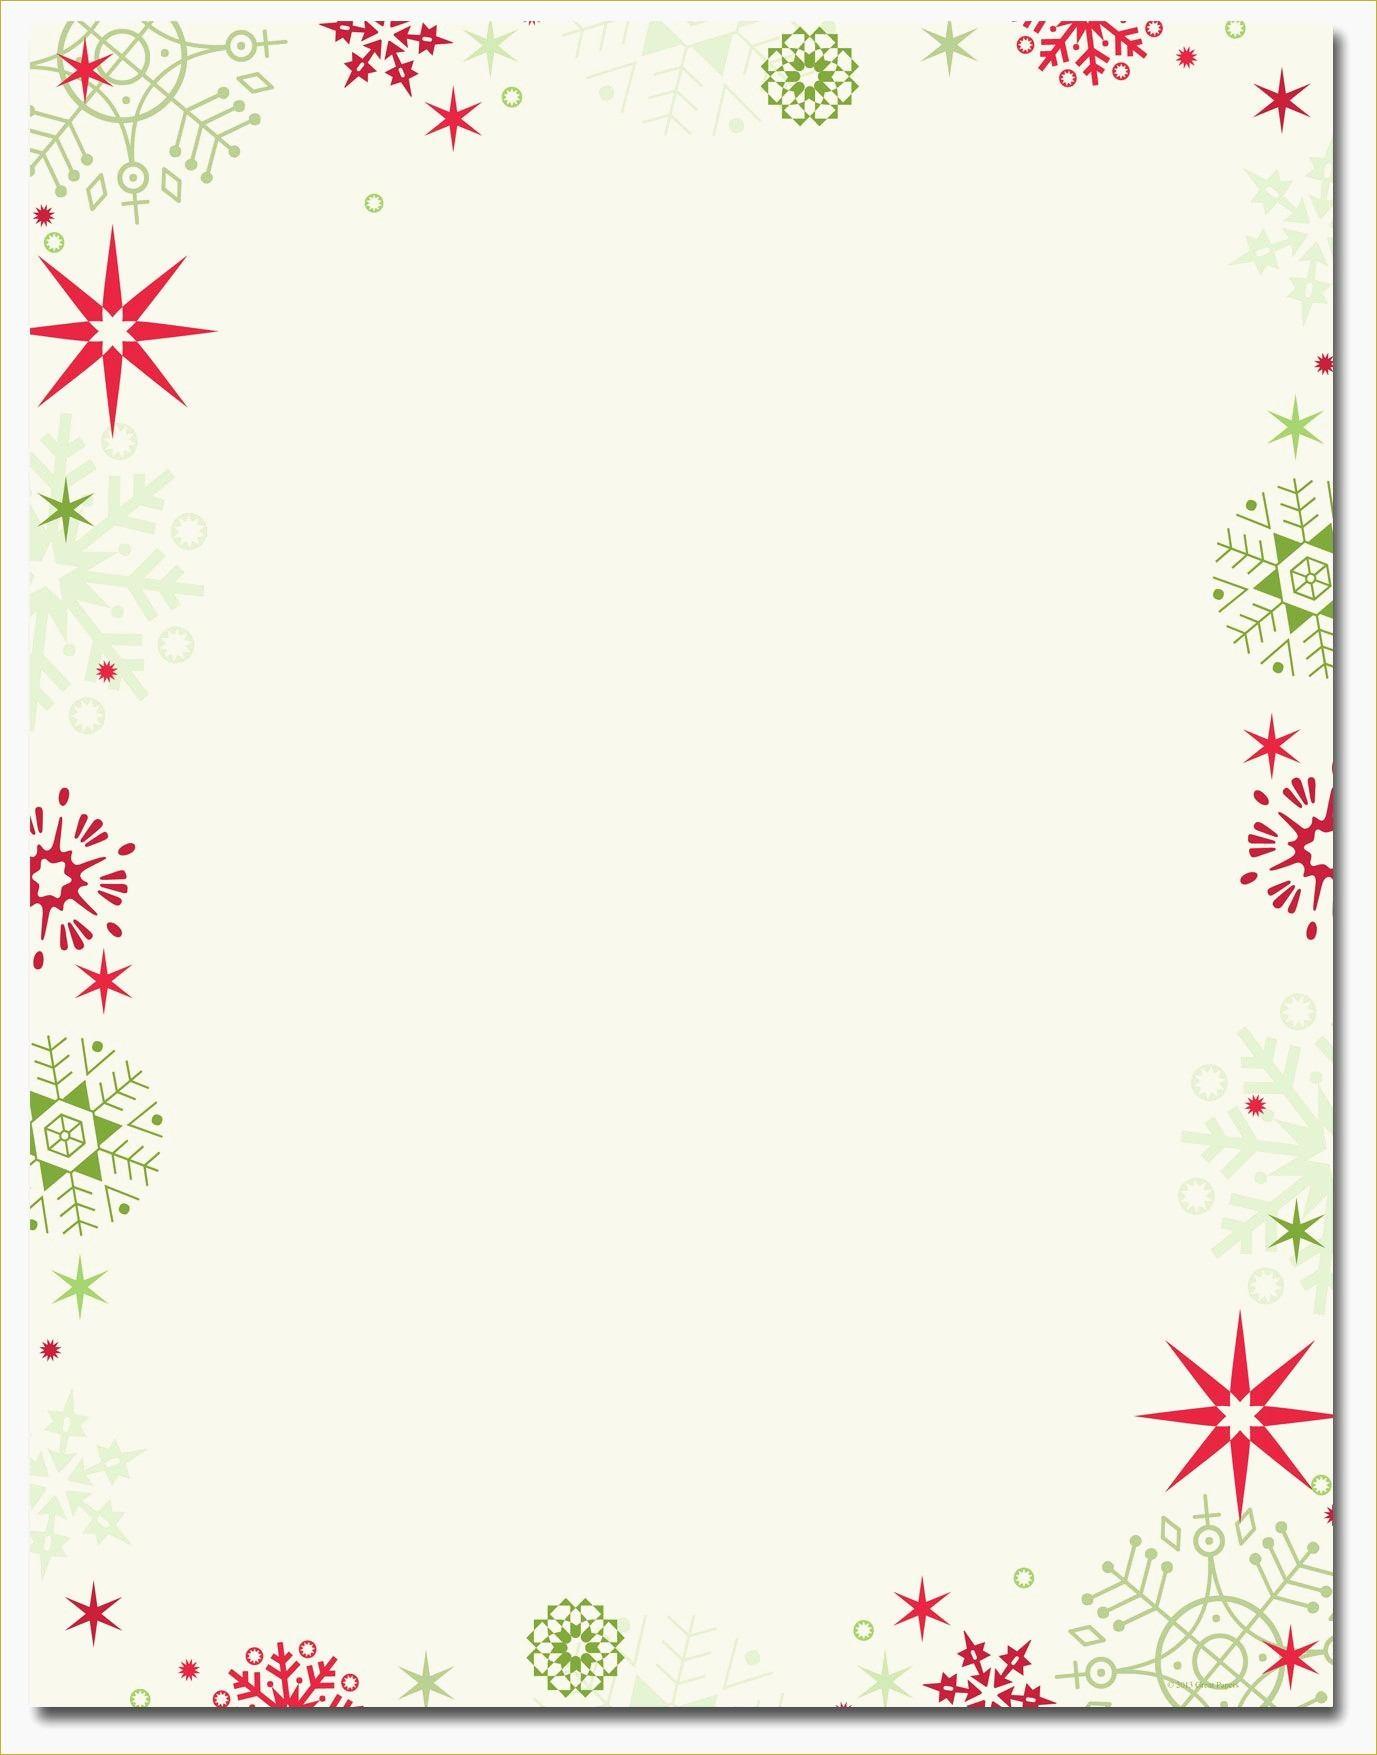 Christmas Letterhead Paper Inspirational Design Regarding Free - Free Printable Santa Letter Paper